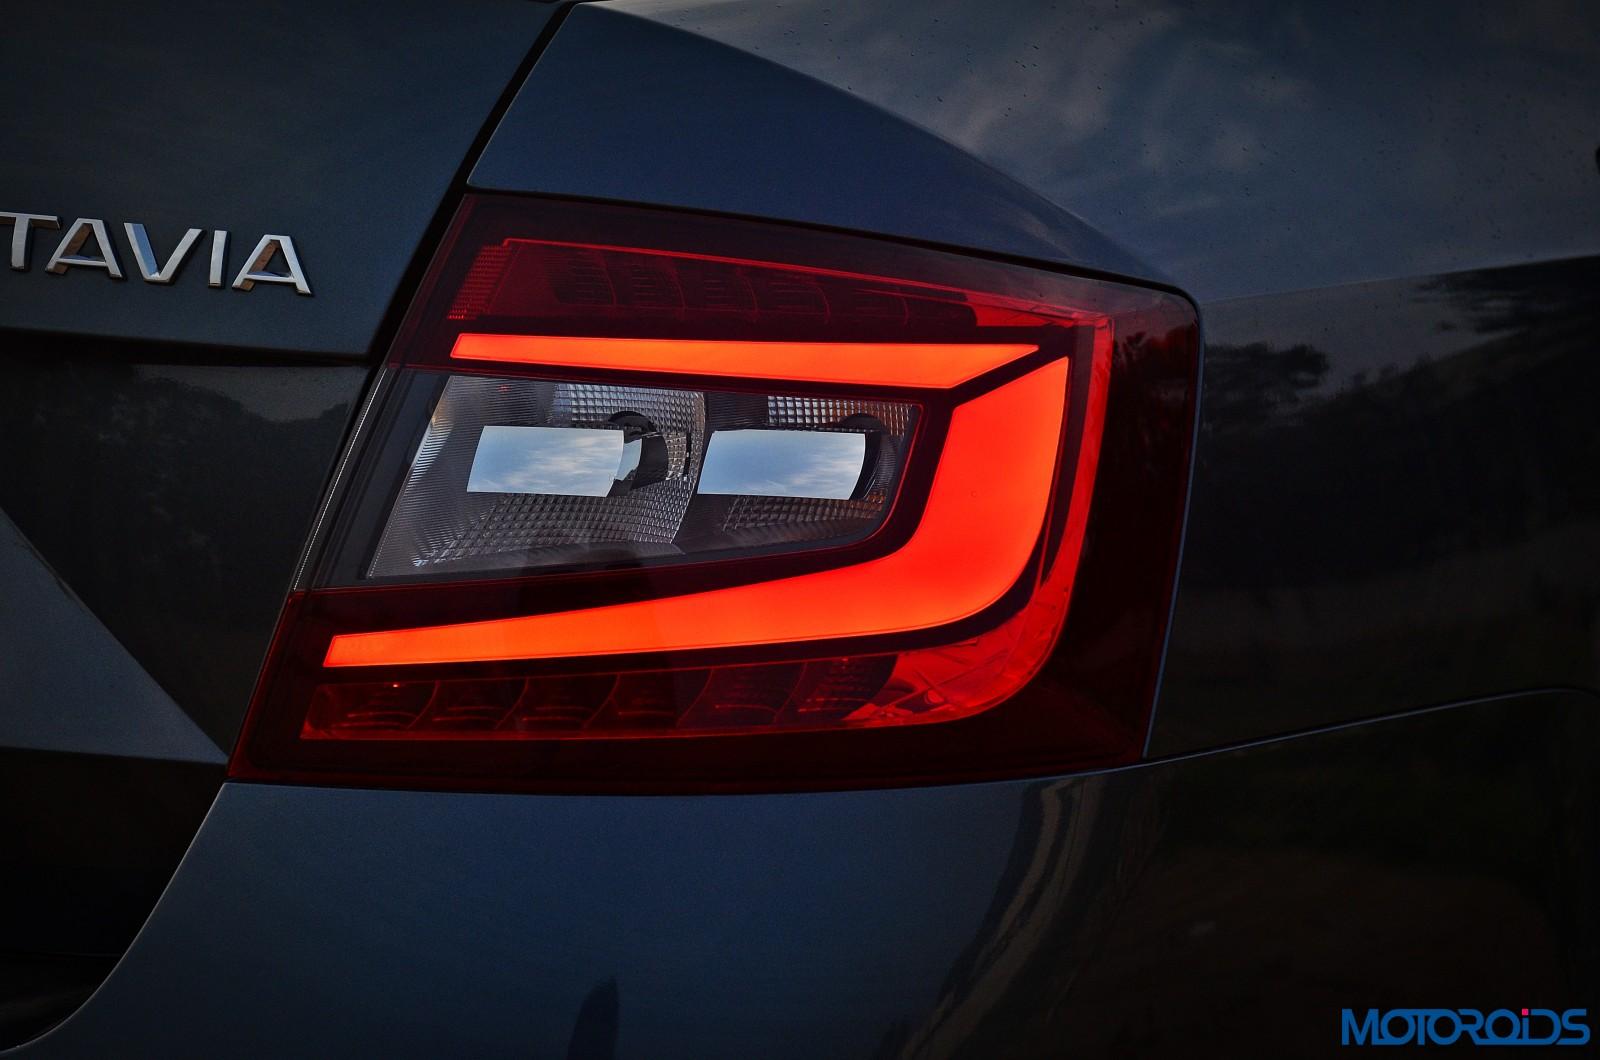 New-2017-Skoda-Octavia-Review-taillight-illumination